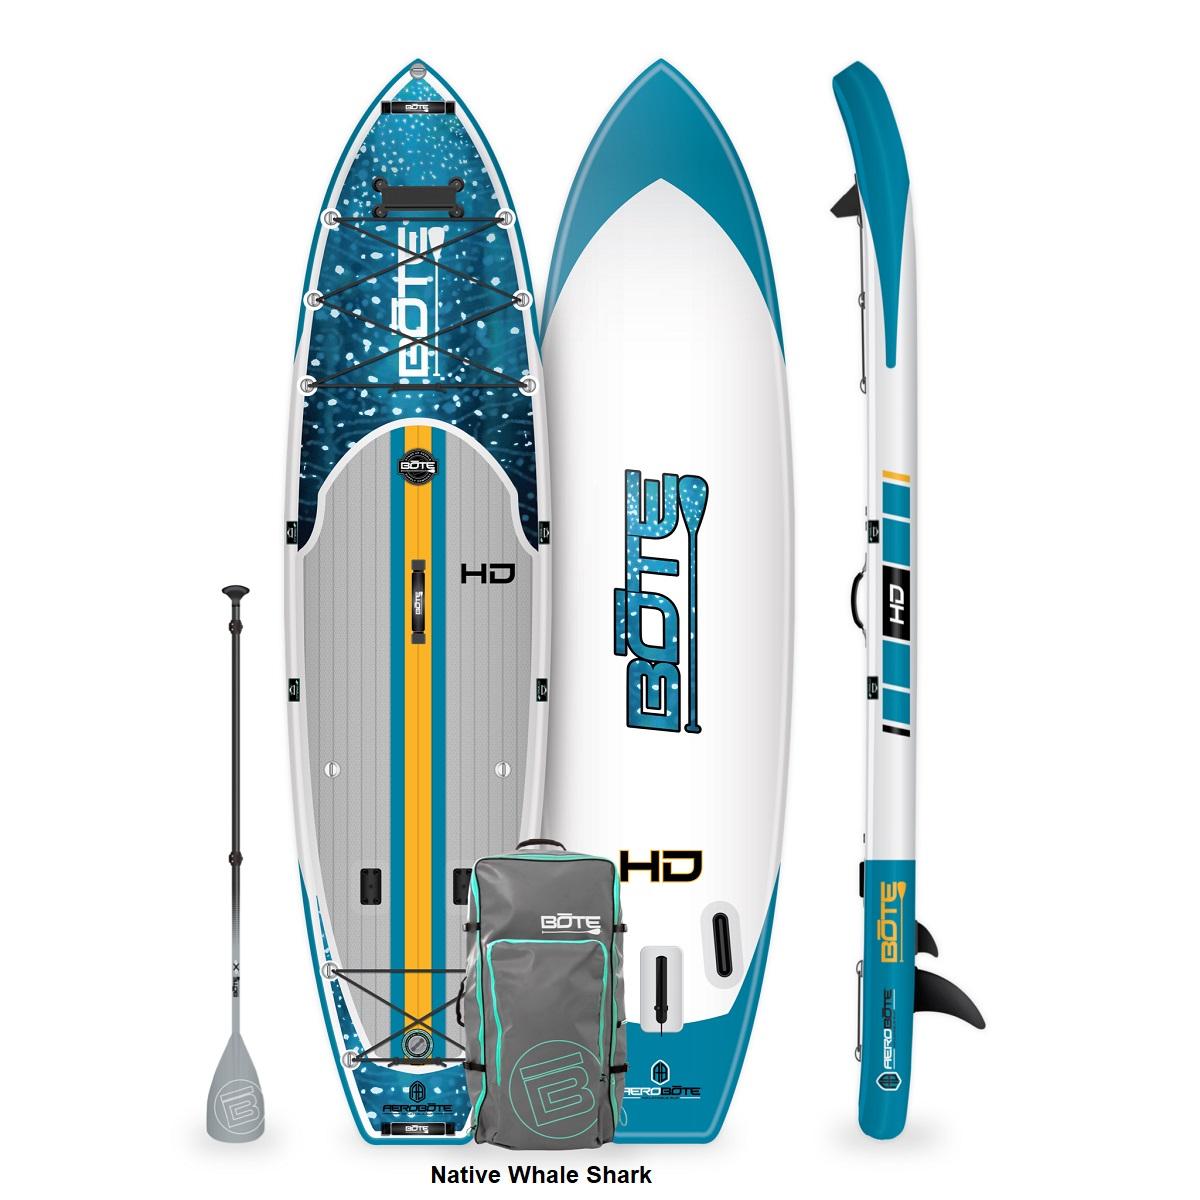 BOTE HD Aero Paddle Board - Native Whale Shark